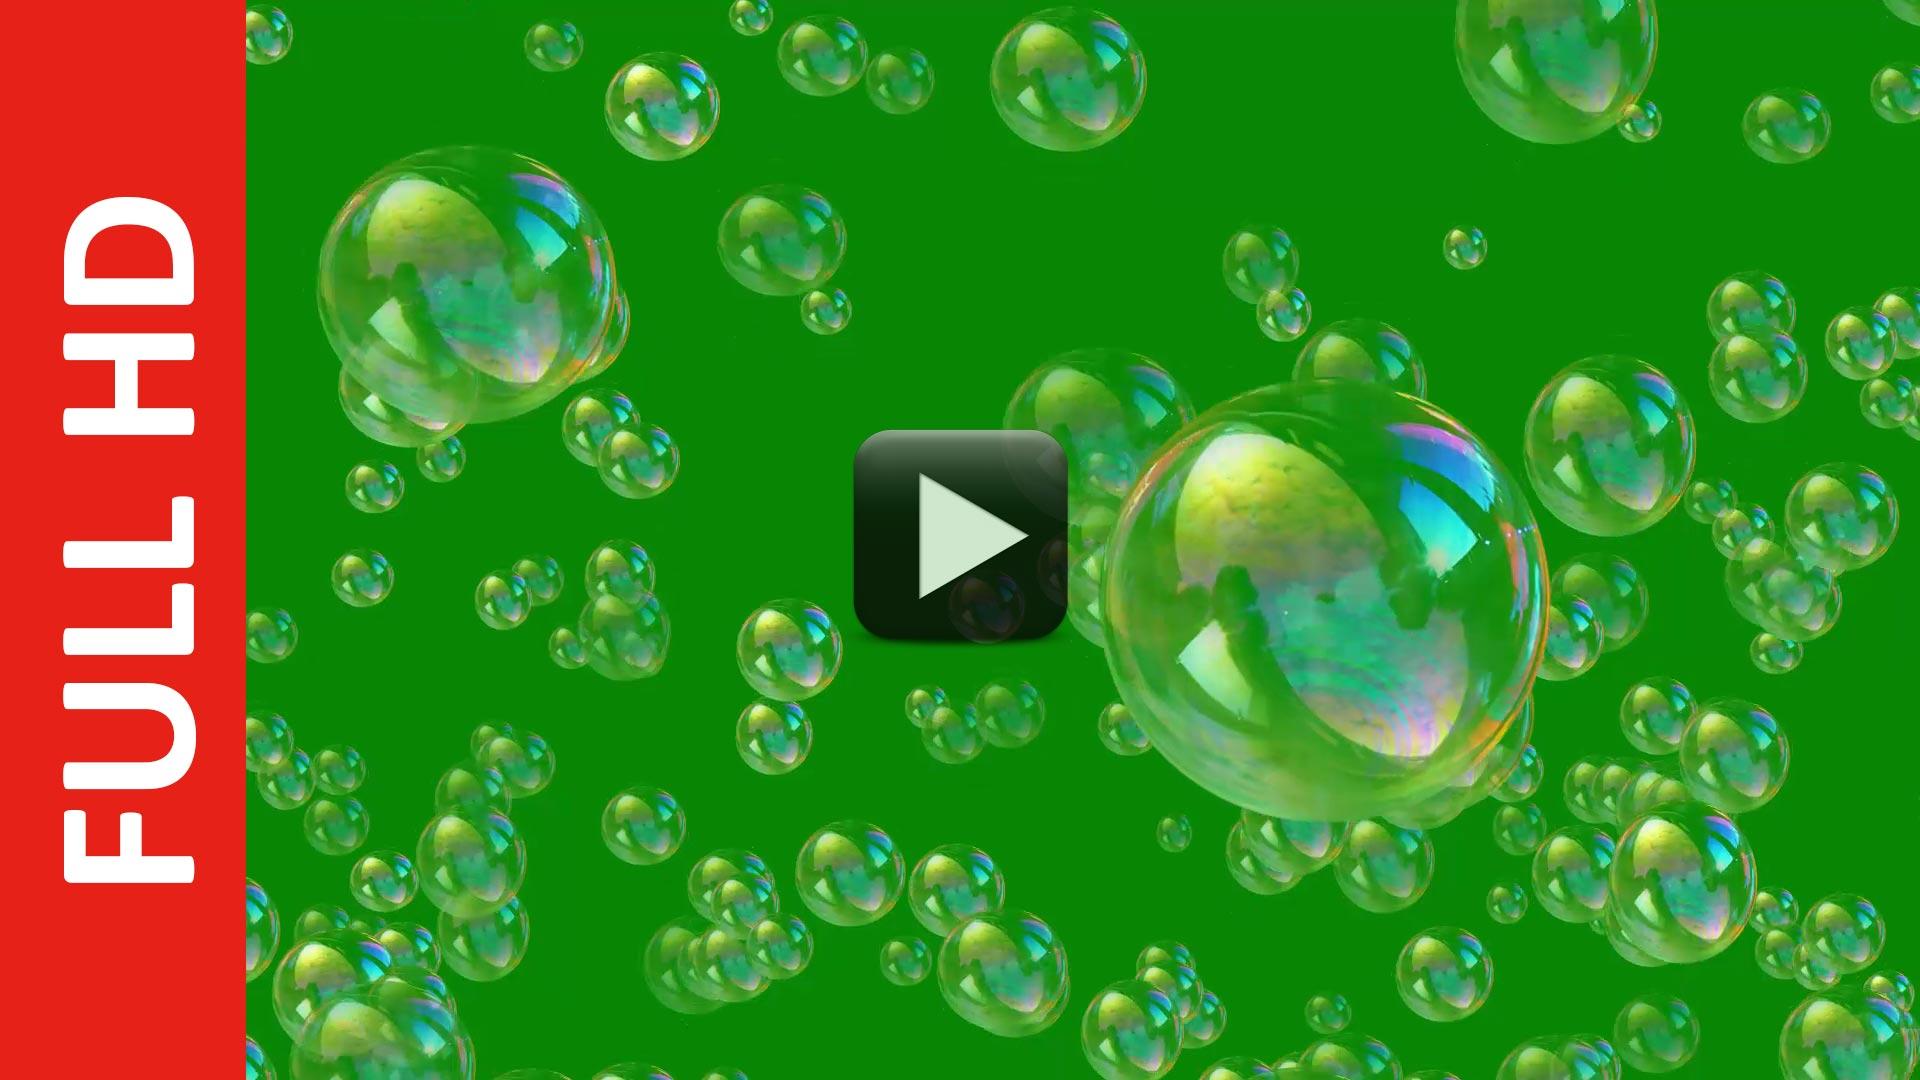 free soap bubbles green screen background all design creative